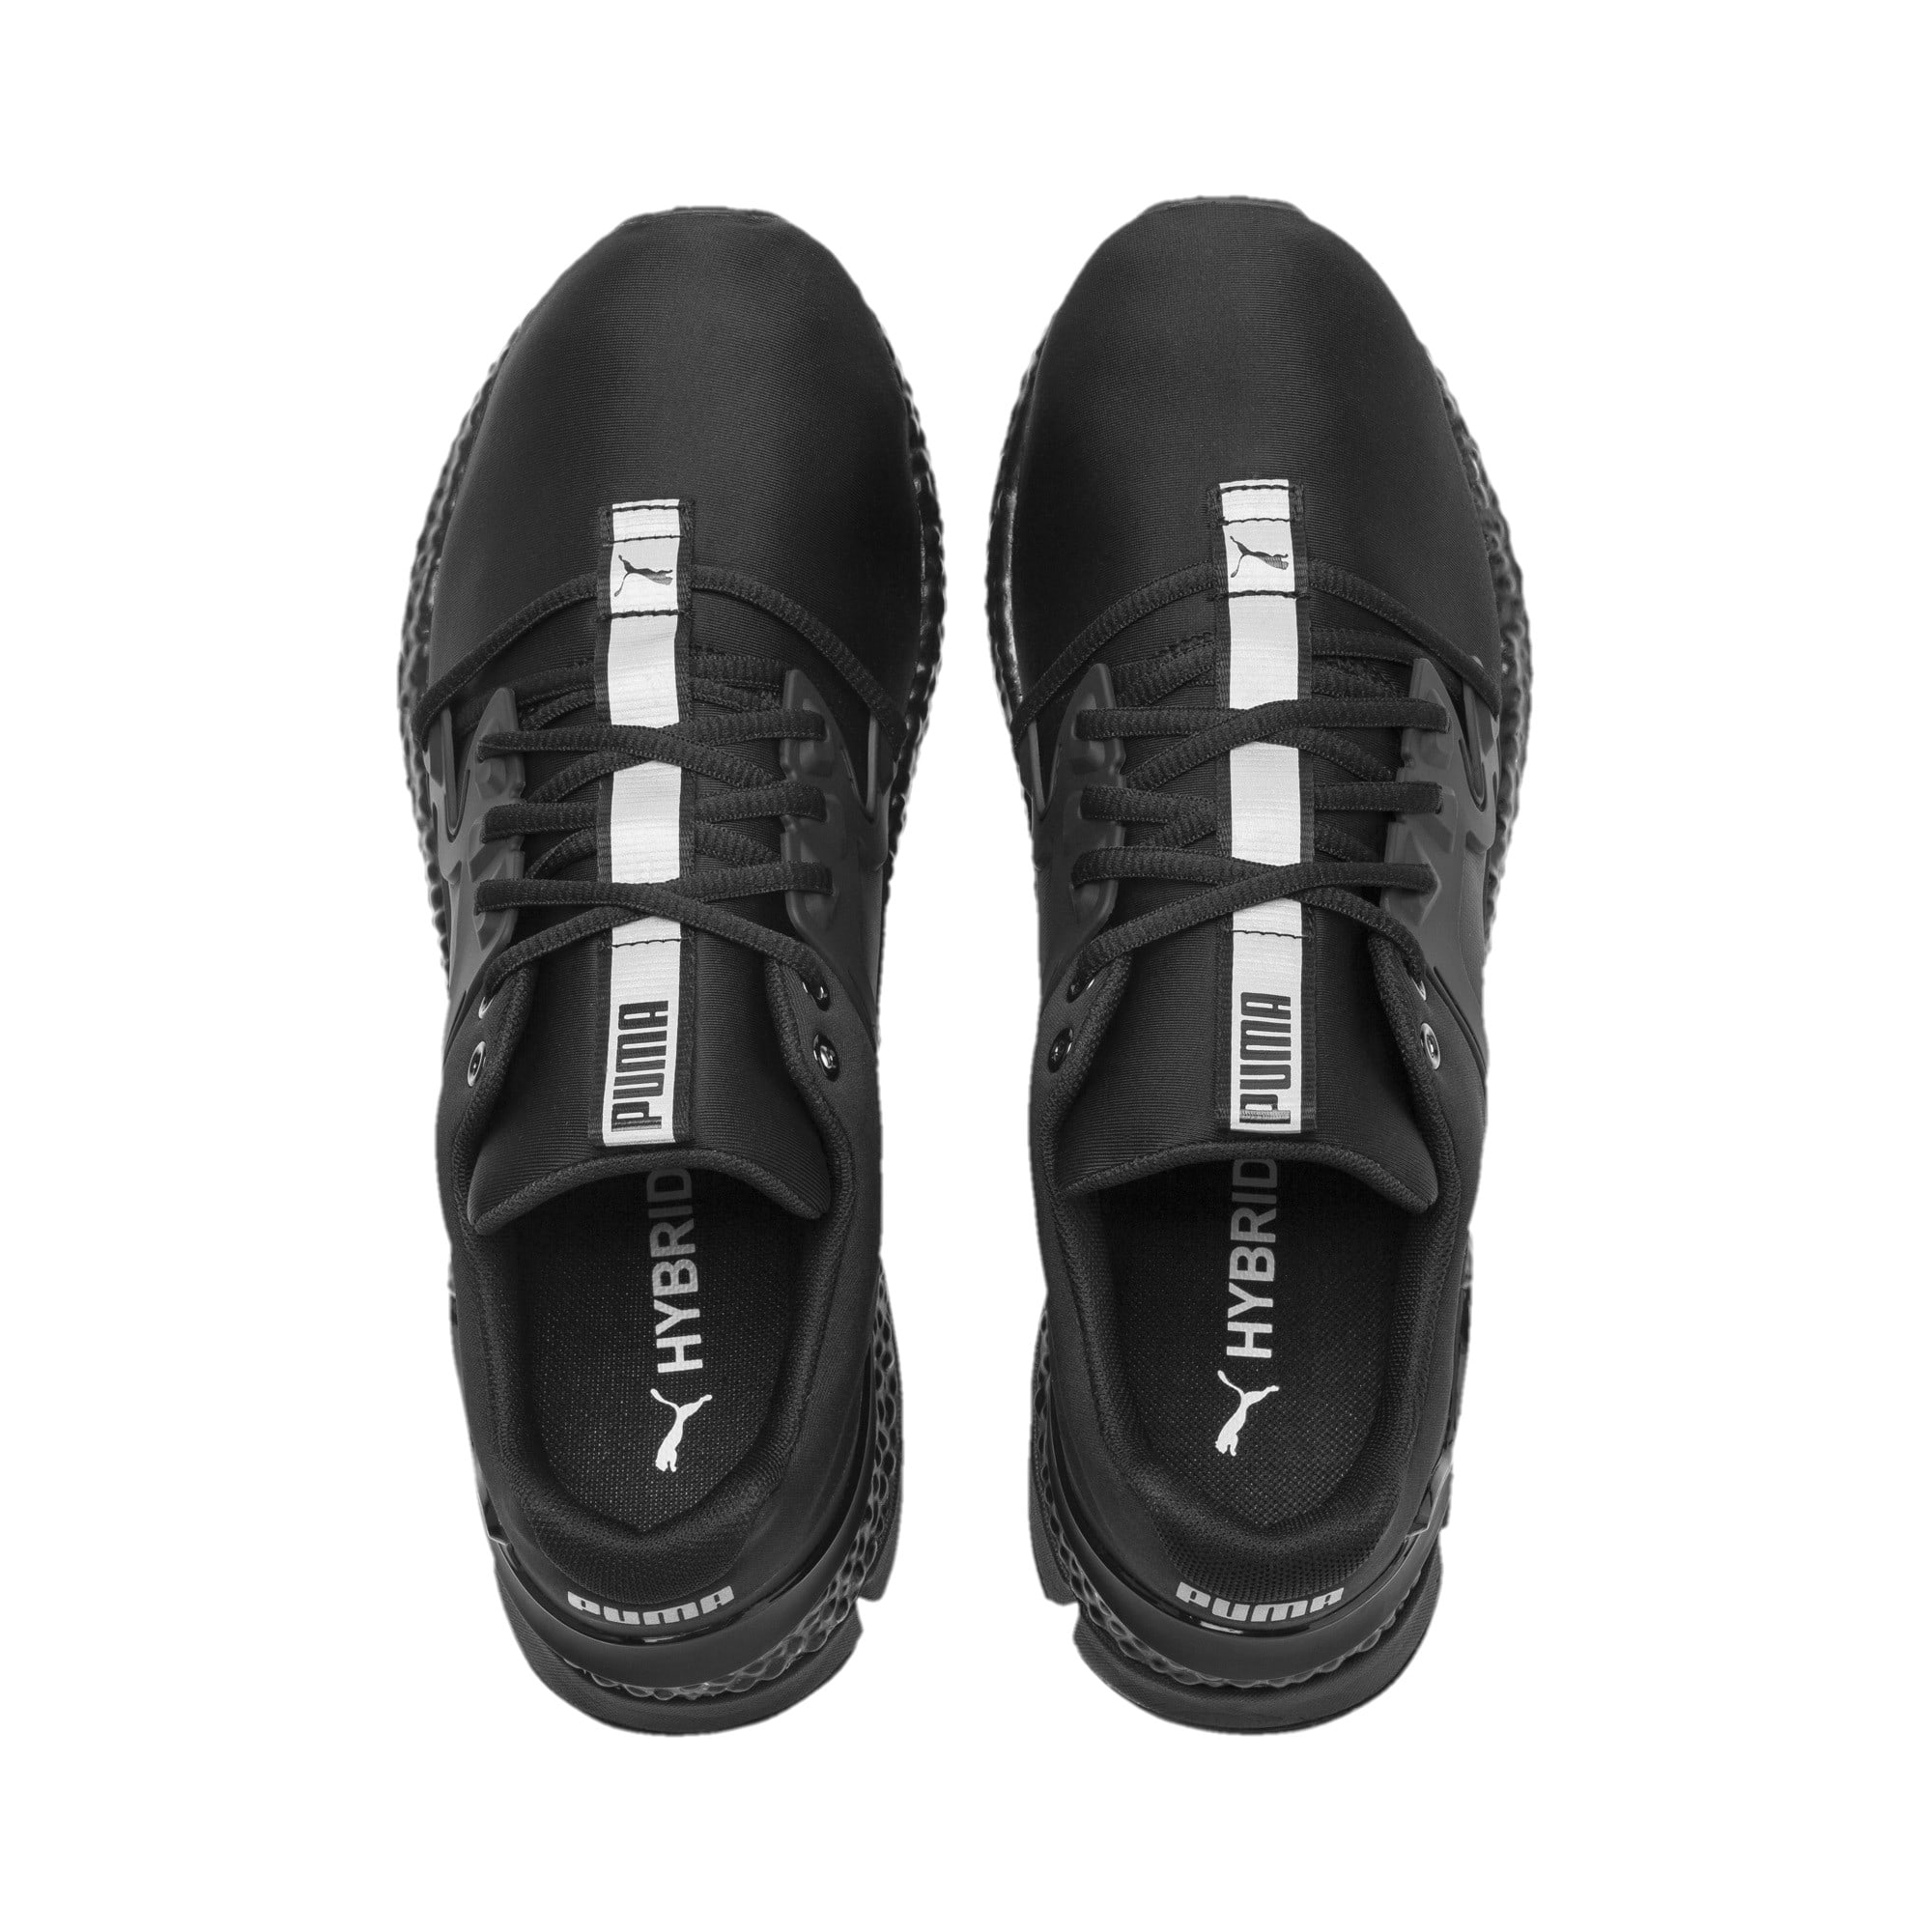 Thumbnail 7 of HYBRID Sky Rave Men's Running Shoes, Puma Black-Puma Aged Silver, medium